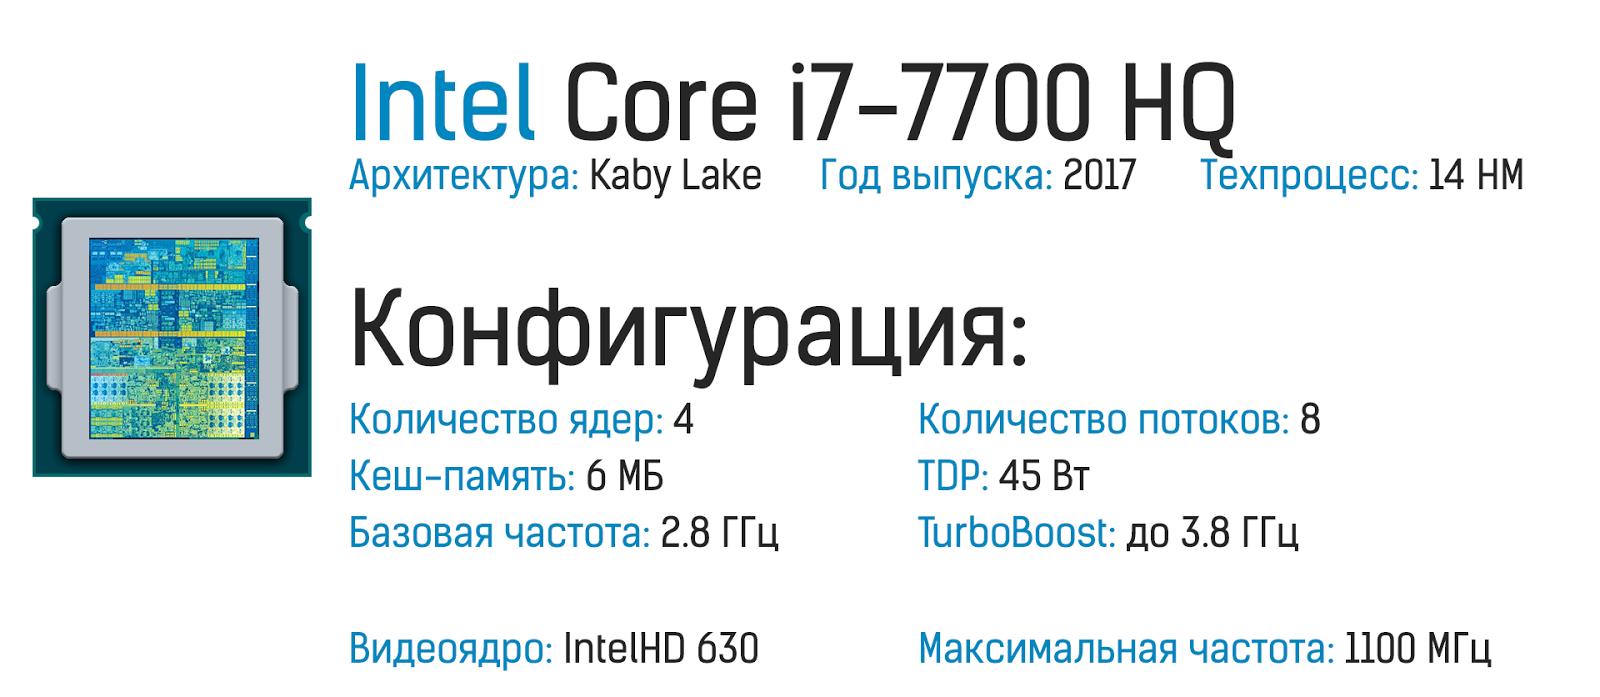 Балансируем на грани разумного с Lenovo Y520 - 15